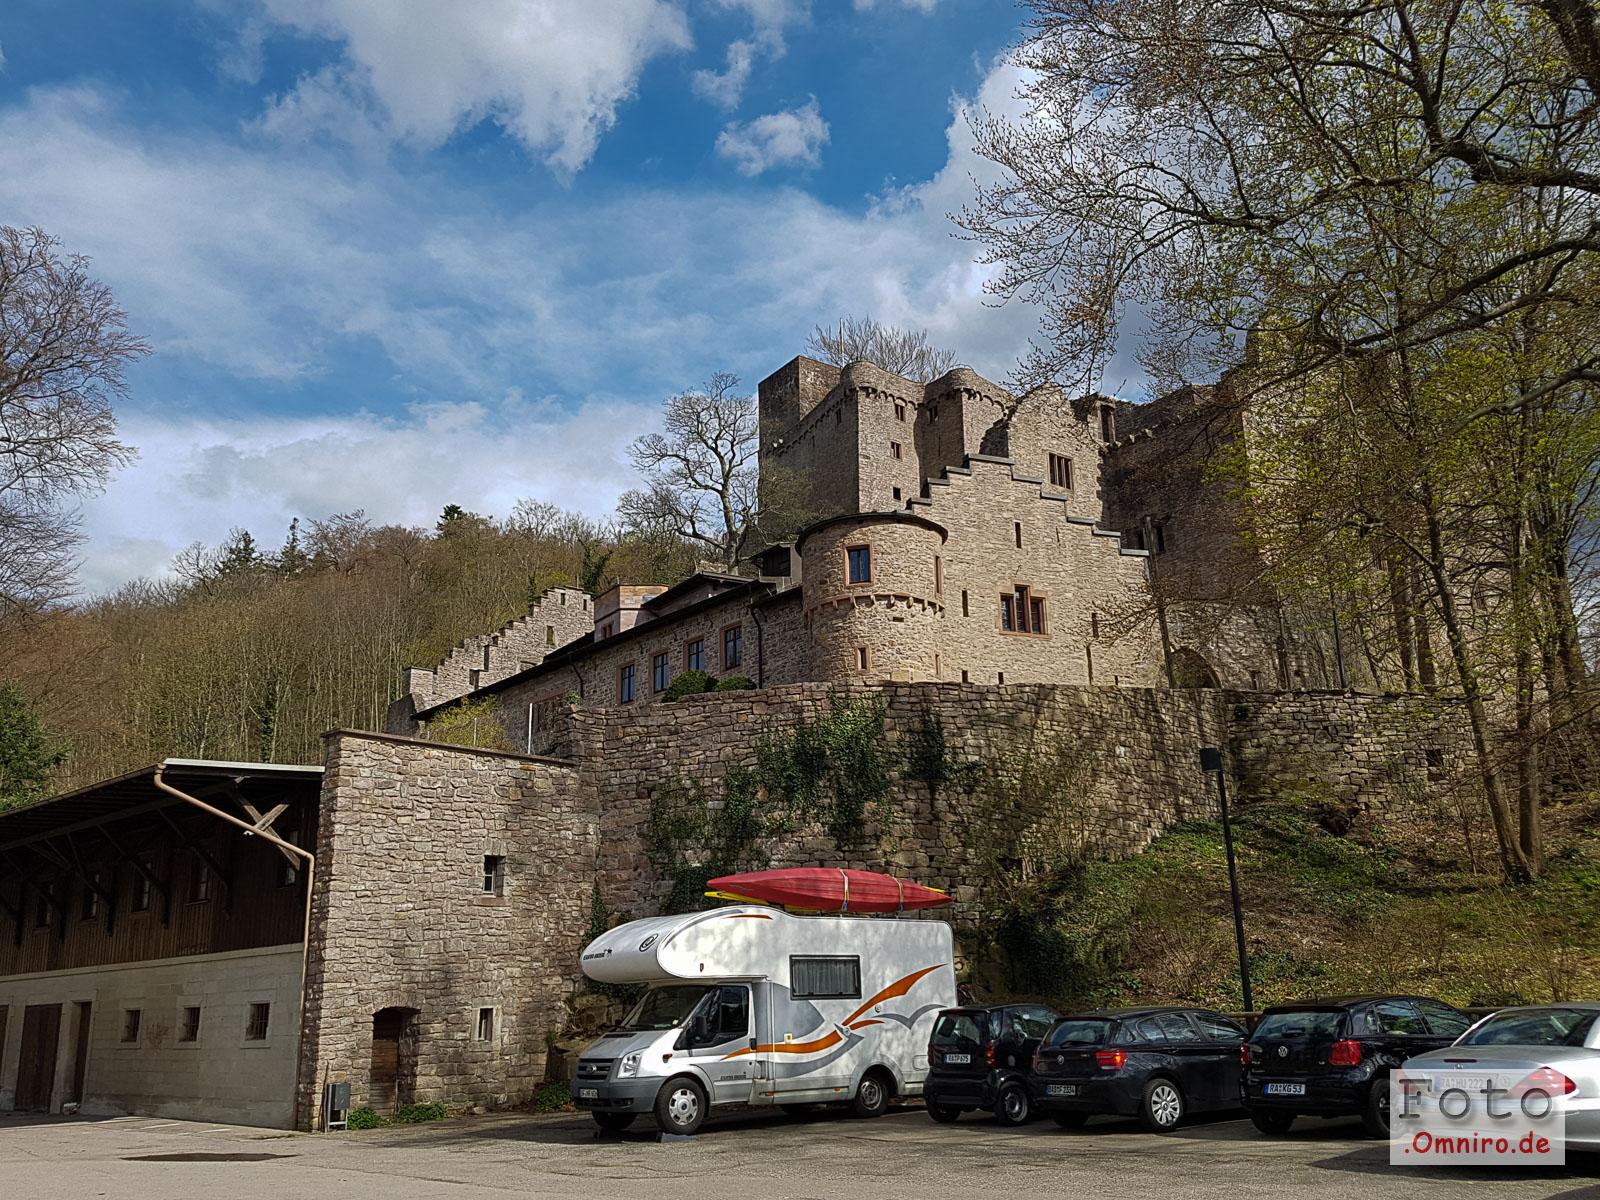 2016-04-08_15-29-40_Bodenseetrip_20160408_152940-1600